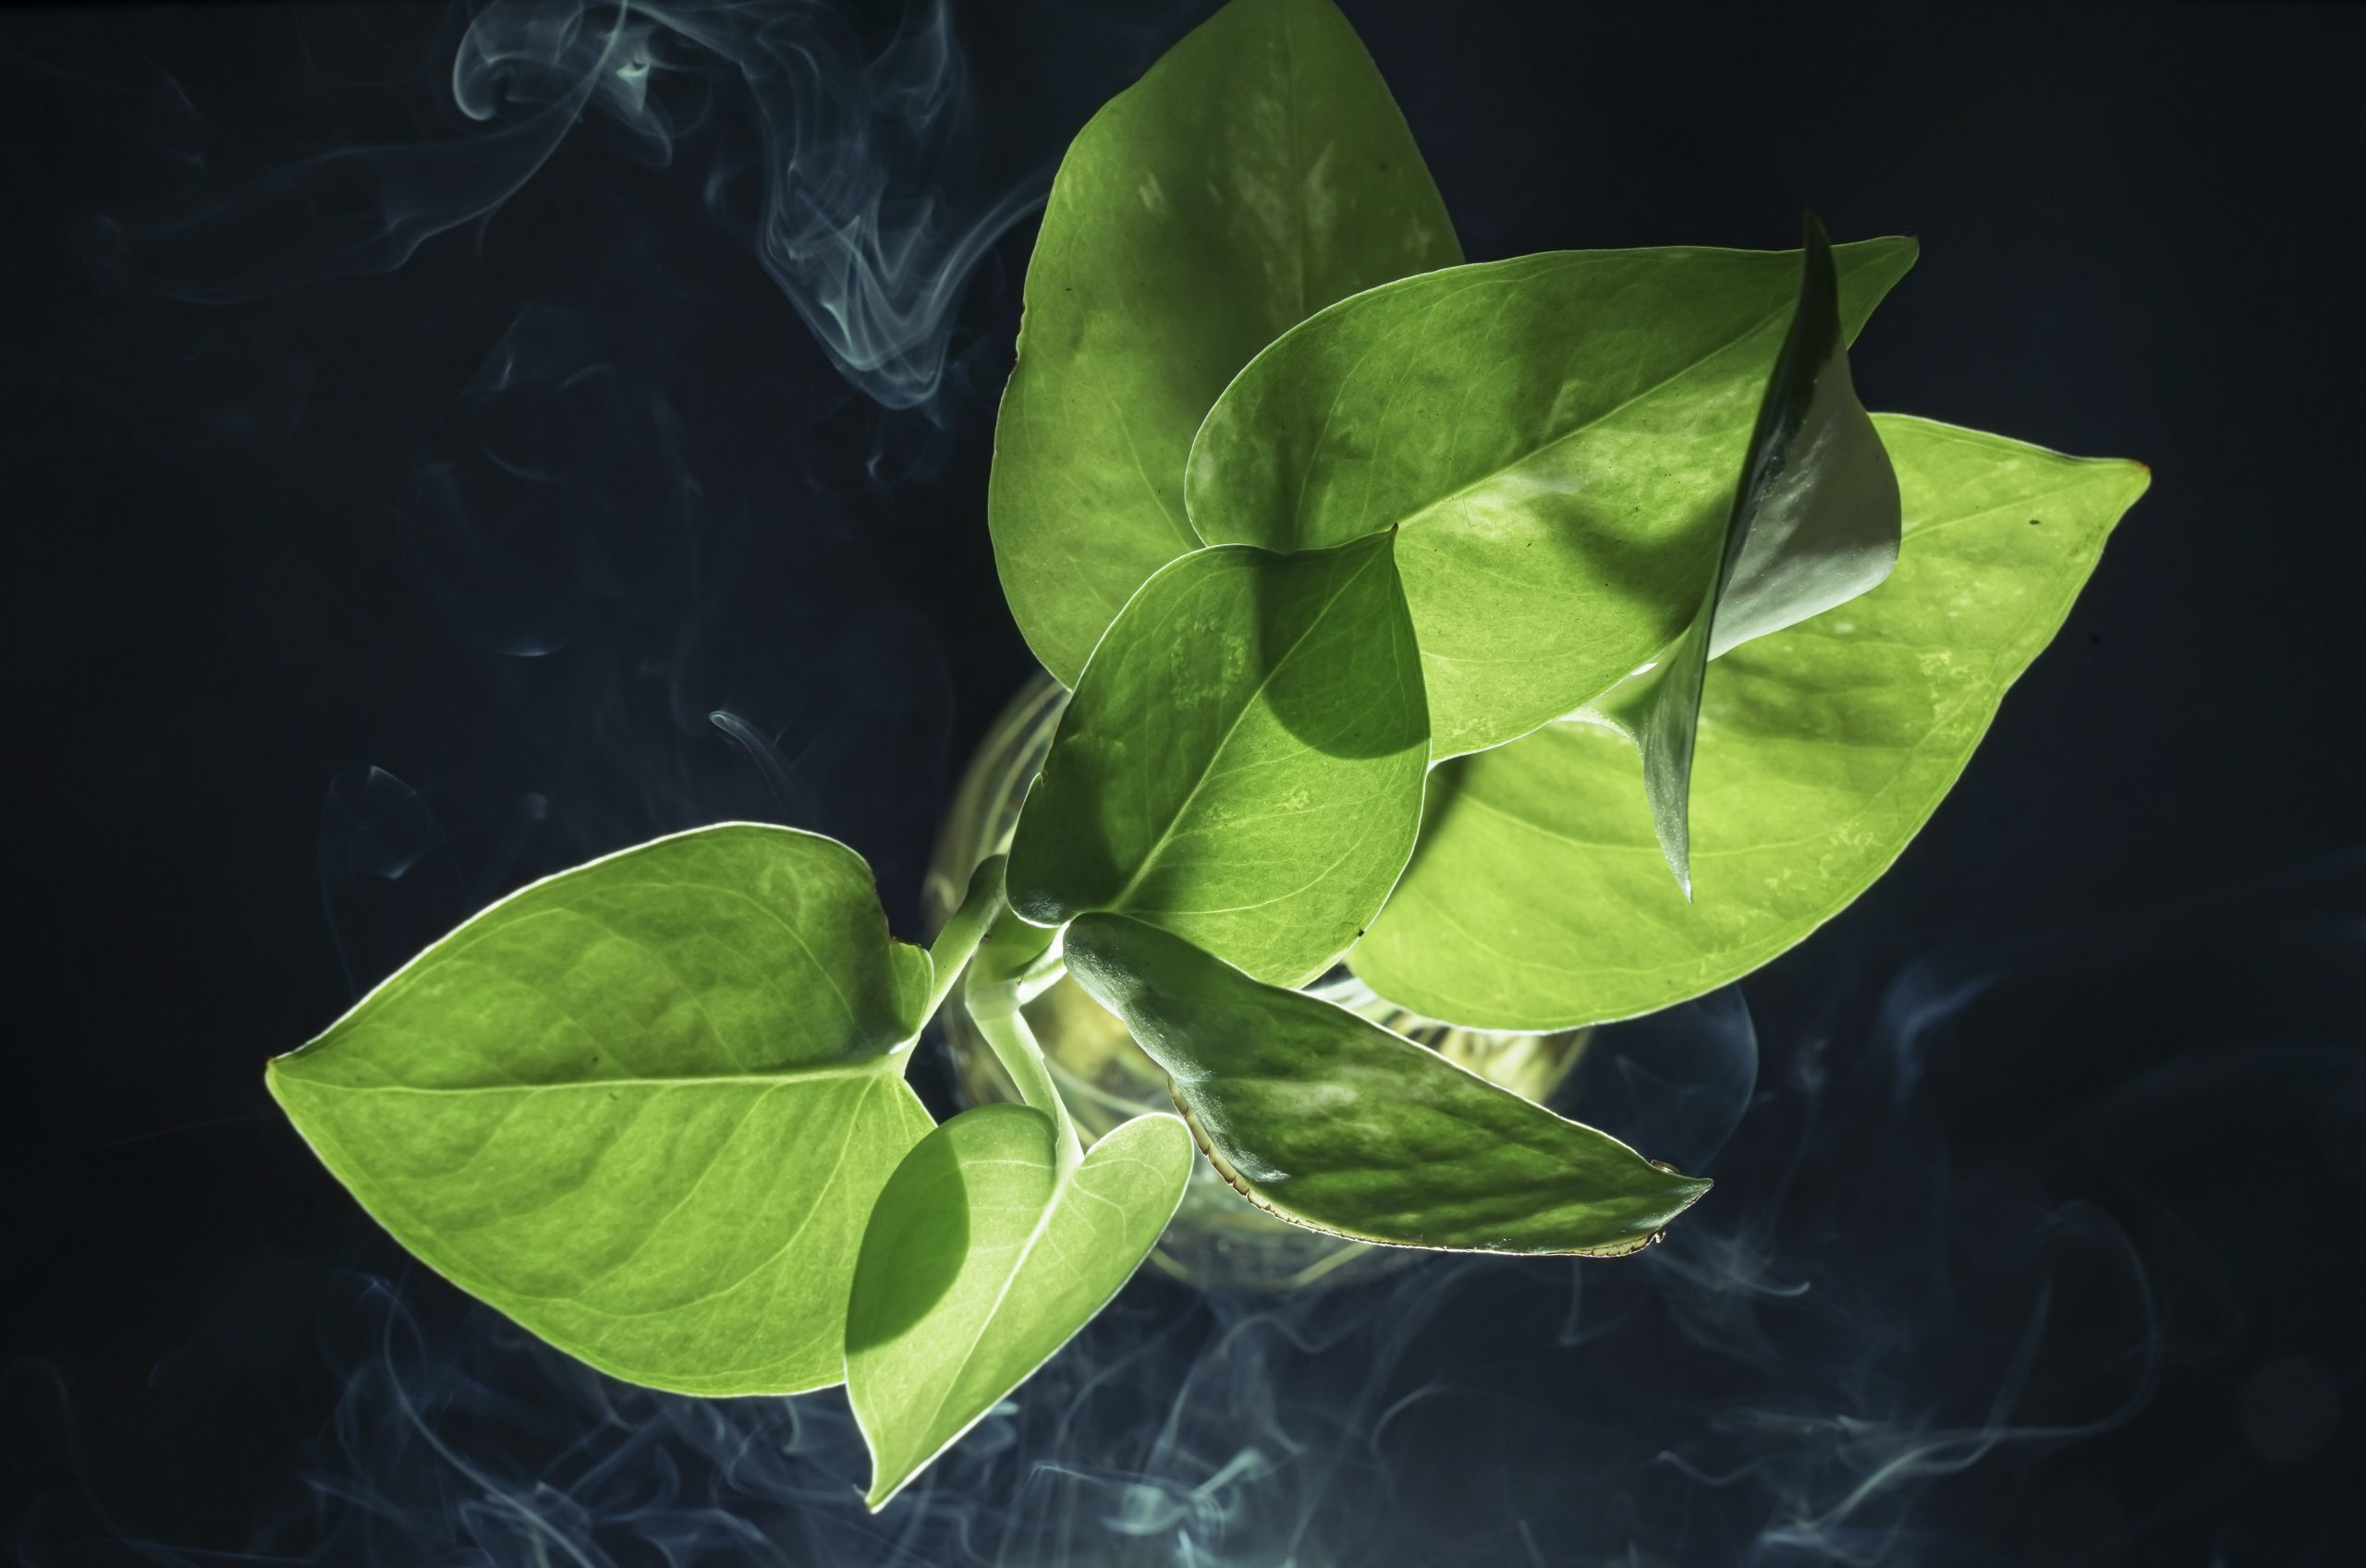 Green Plant on a dark background